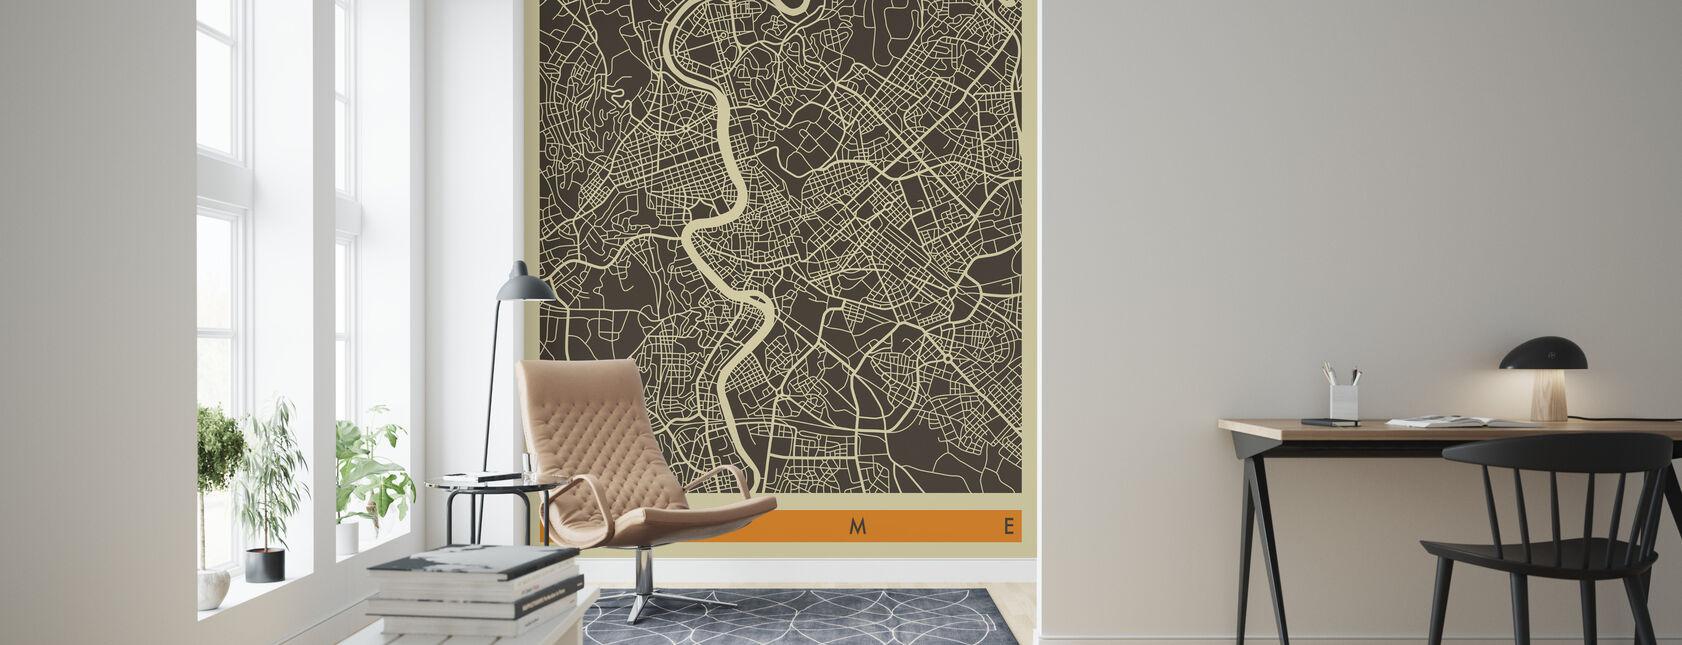 City Map - Rome - Wallpaper - Living Room